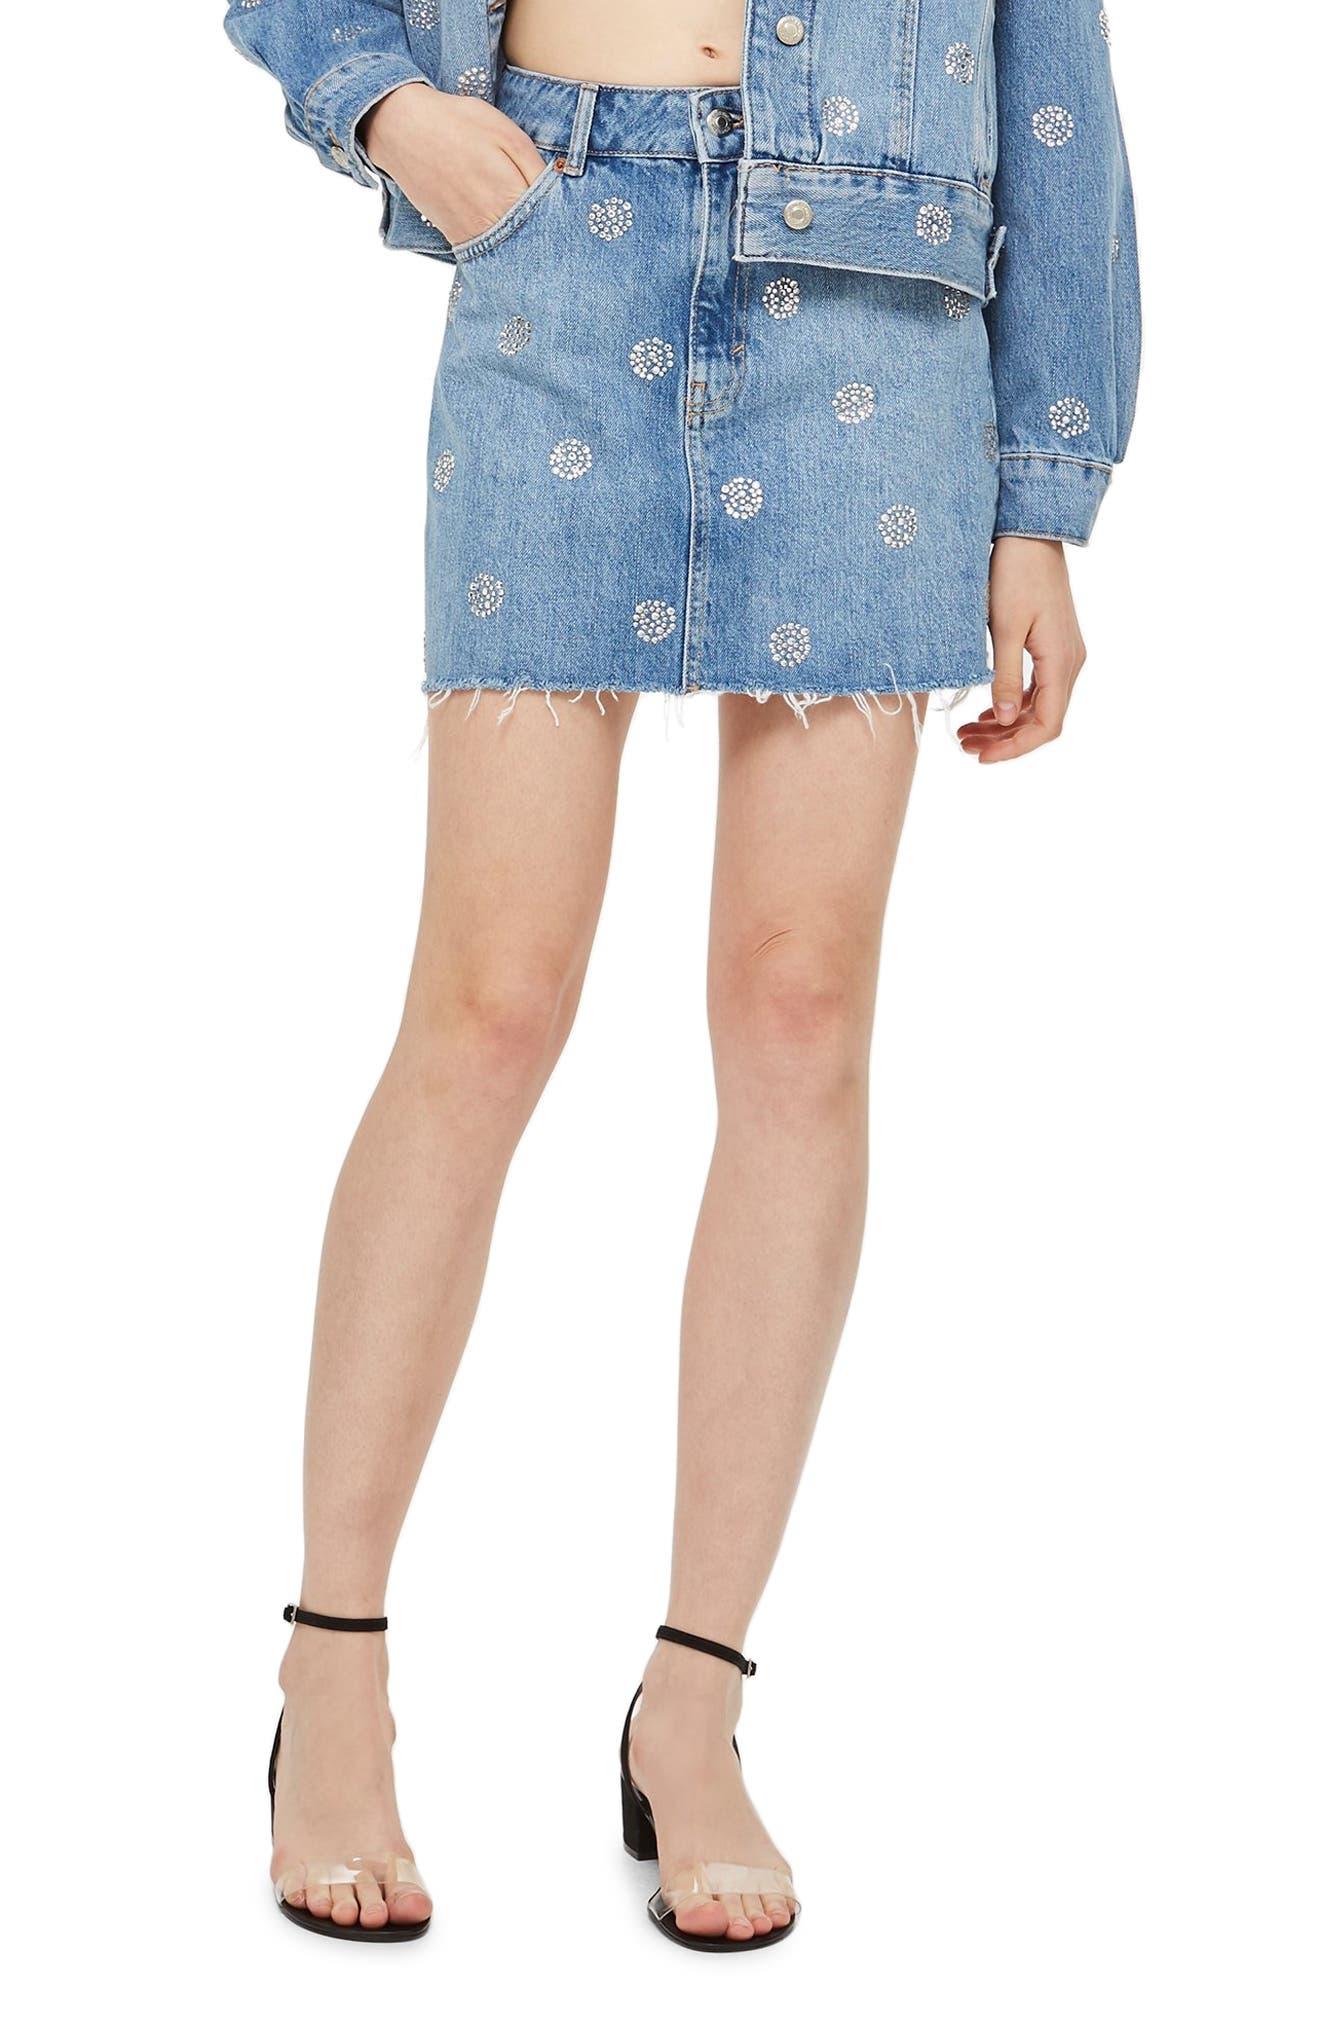 Topshop Diamante Polka Dot Nonstretch Denim Skirt, US (fits like 0) - Blue